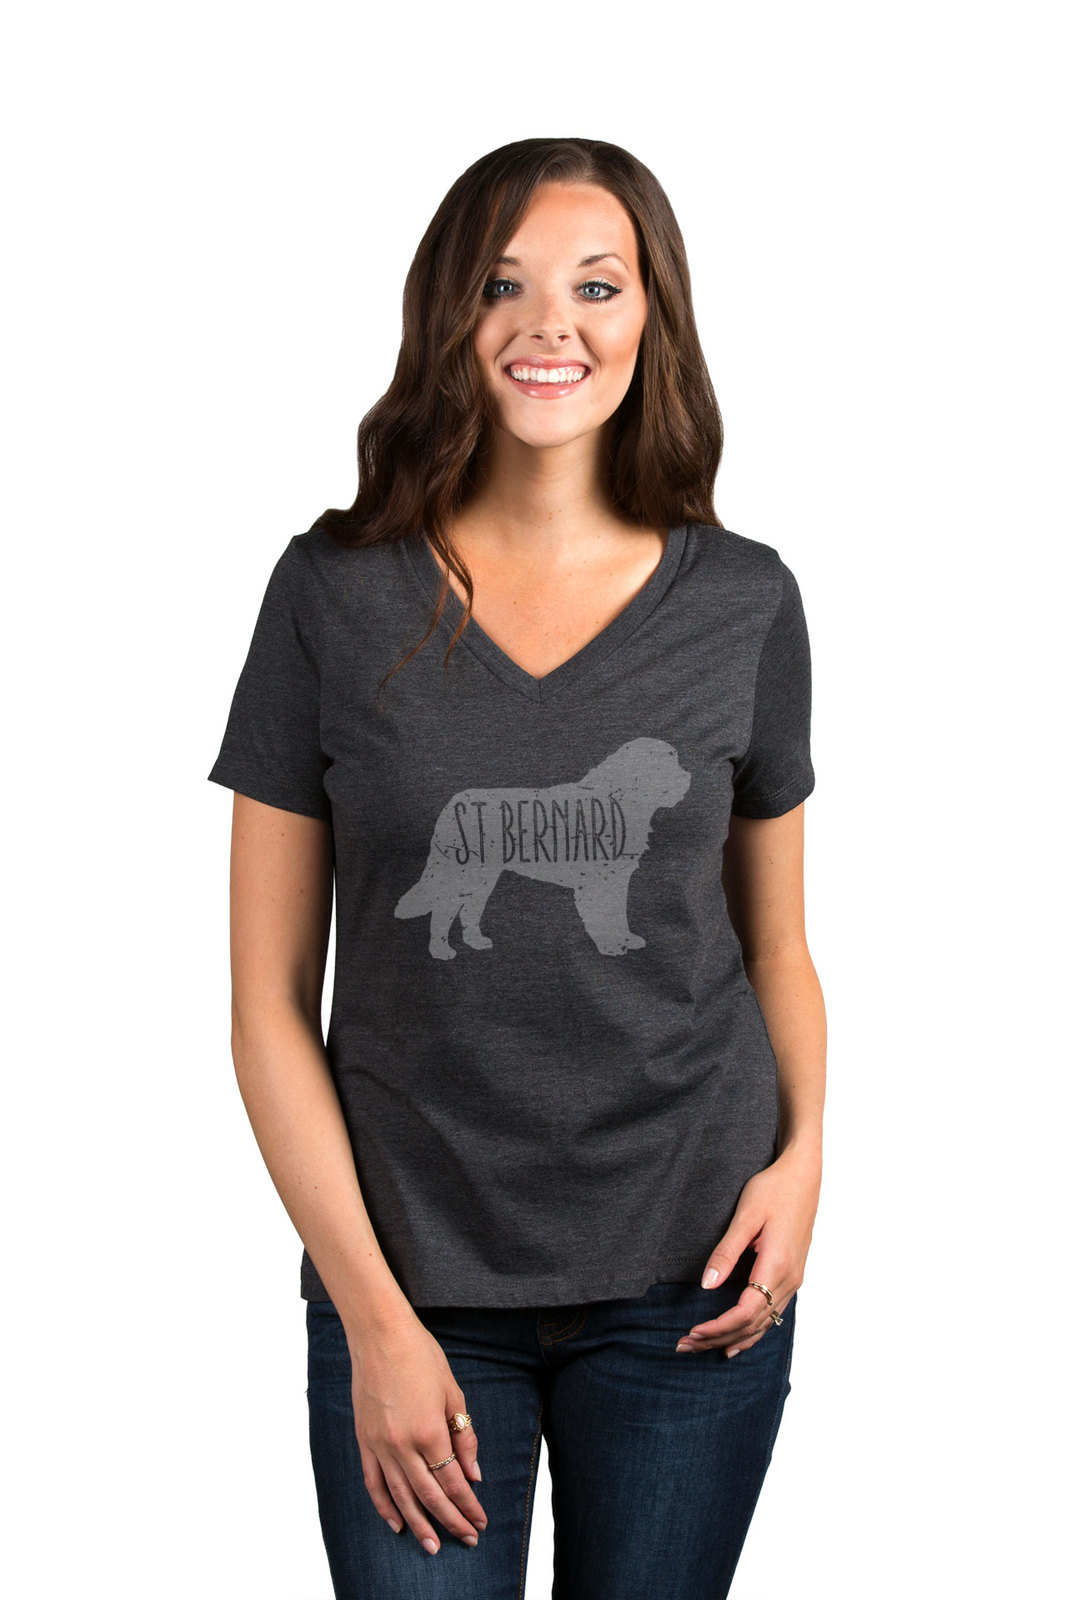 Thread Tank St Bernard Dog Silhouette Women's Relaxed V-Neck T-Shirt Tee Charcoa